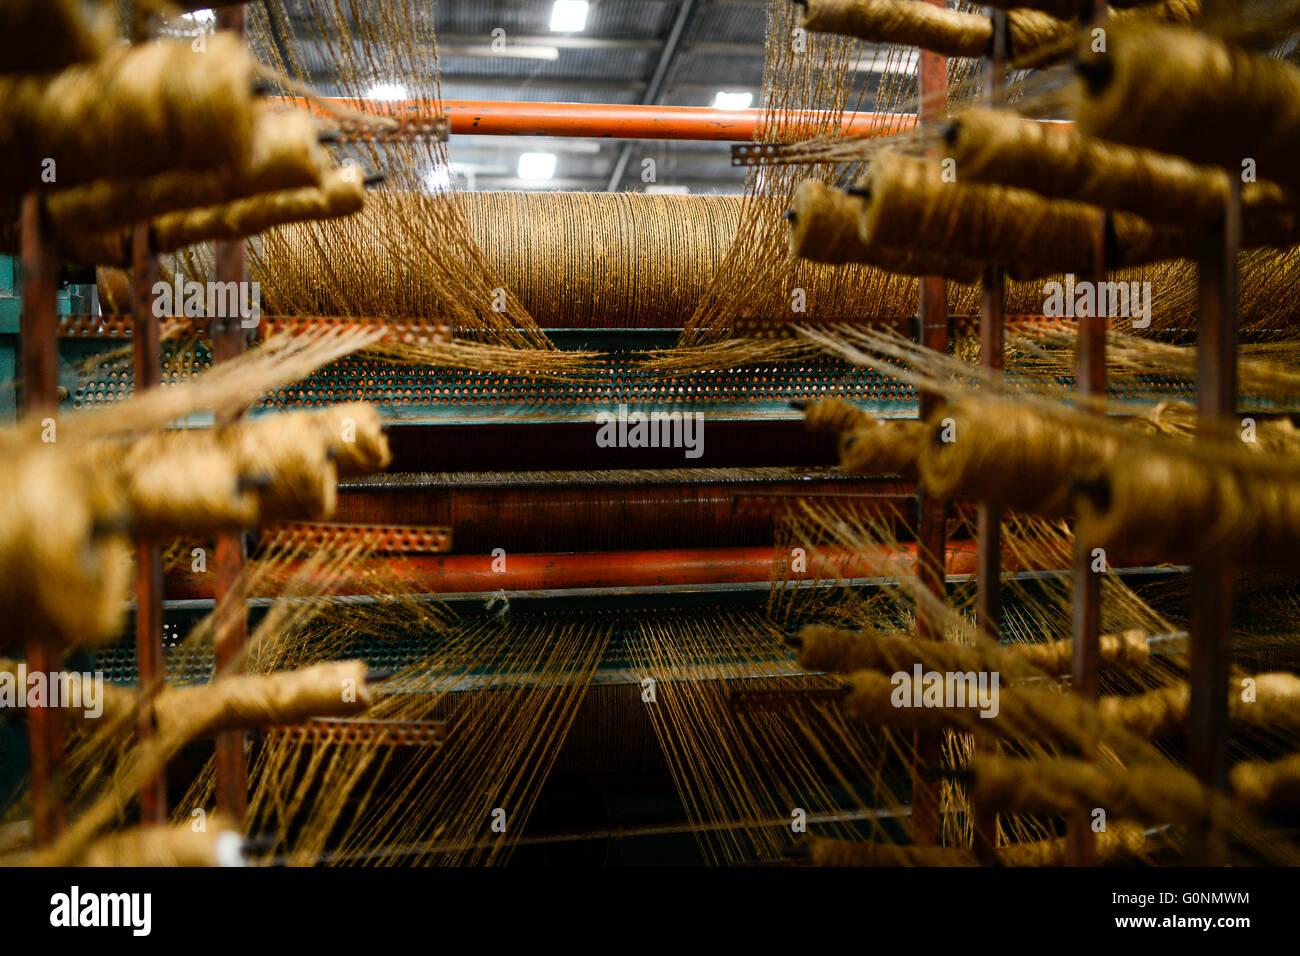 TANZANIA Tanga, Sisal industry, Tancord 1998 Ltd., processing of sisal fibres to carpet, weaving / TANSANIA Tanga, - Stock Image